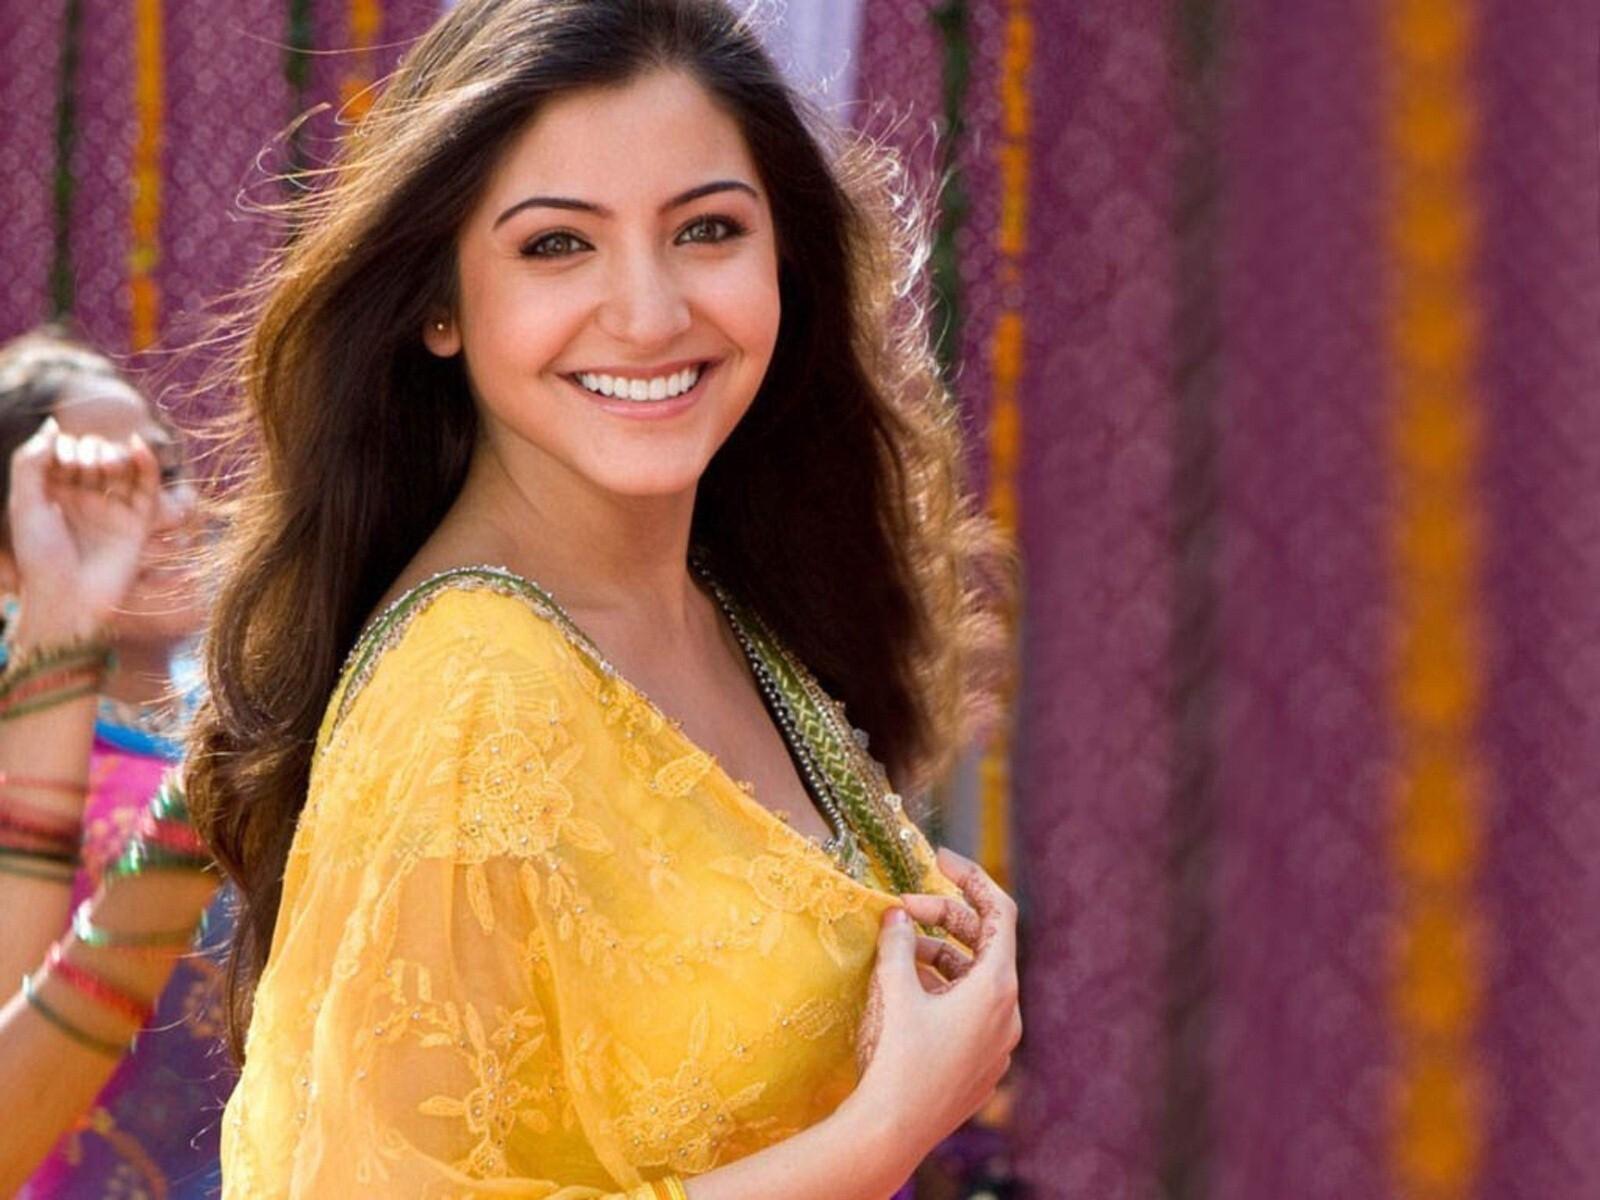 anushka sharma in yellow dress | hd wallpapers